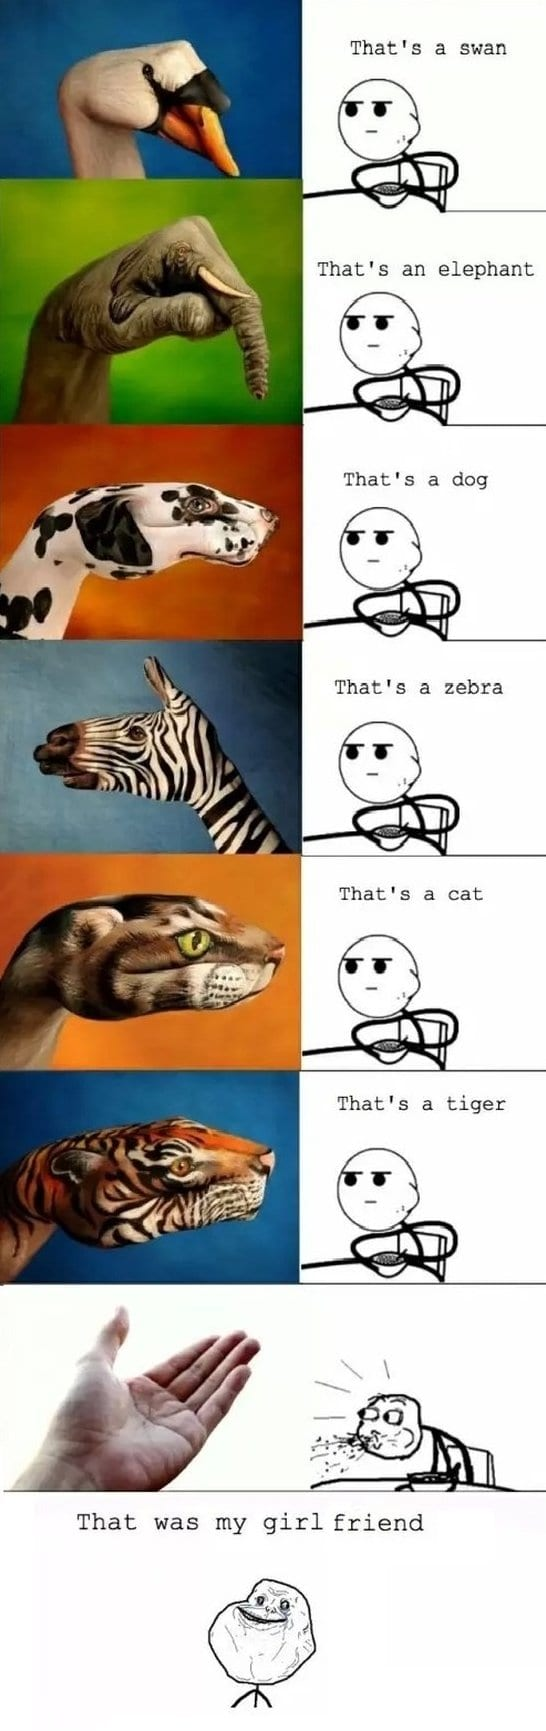 Funny Meme Pictures 2014 : Meme